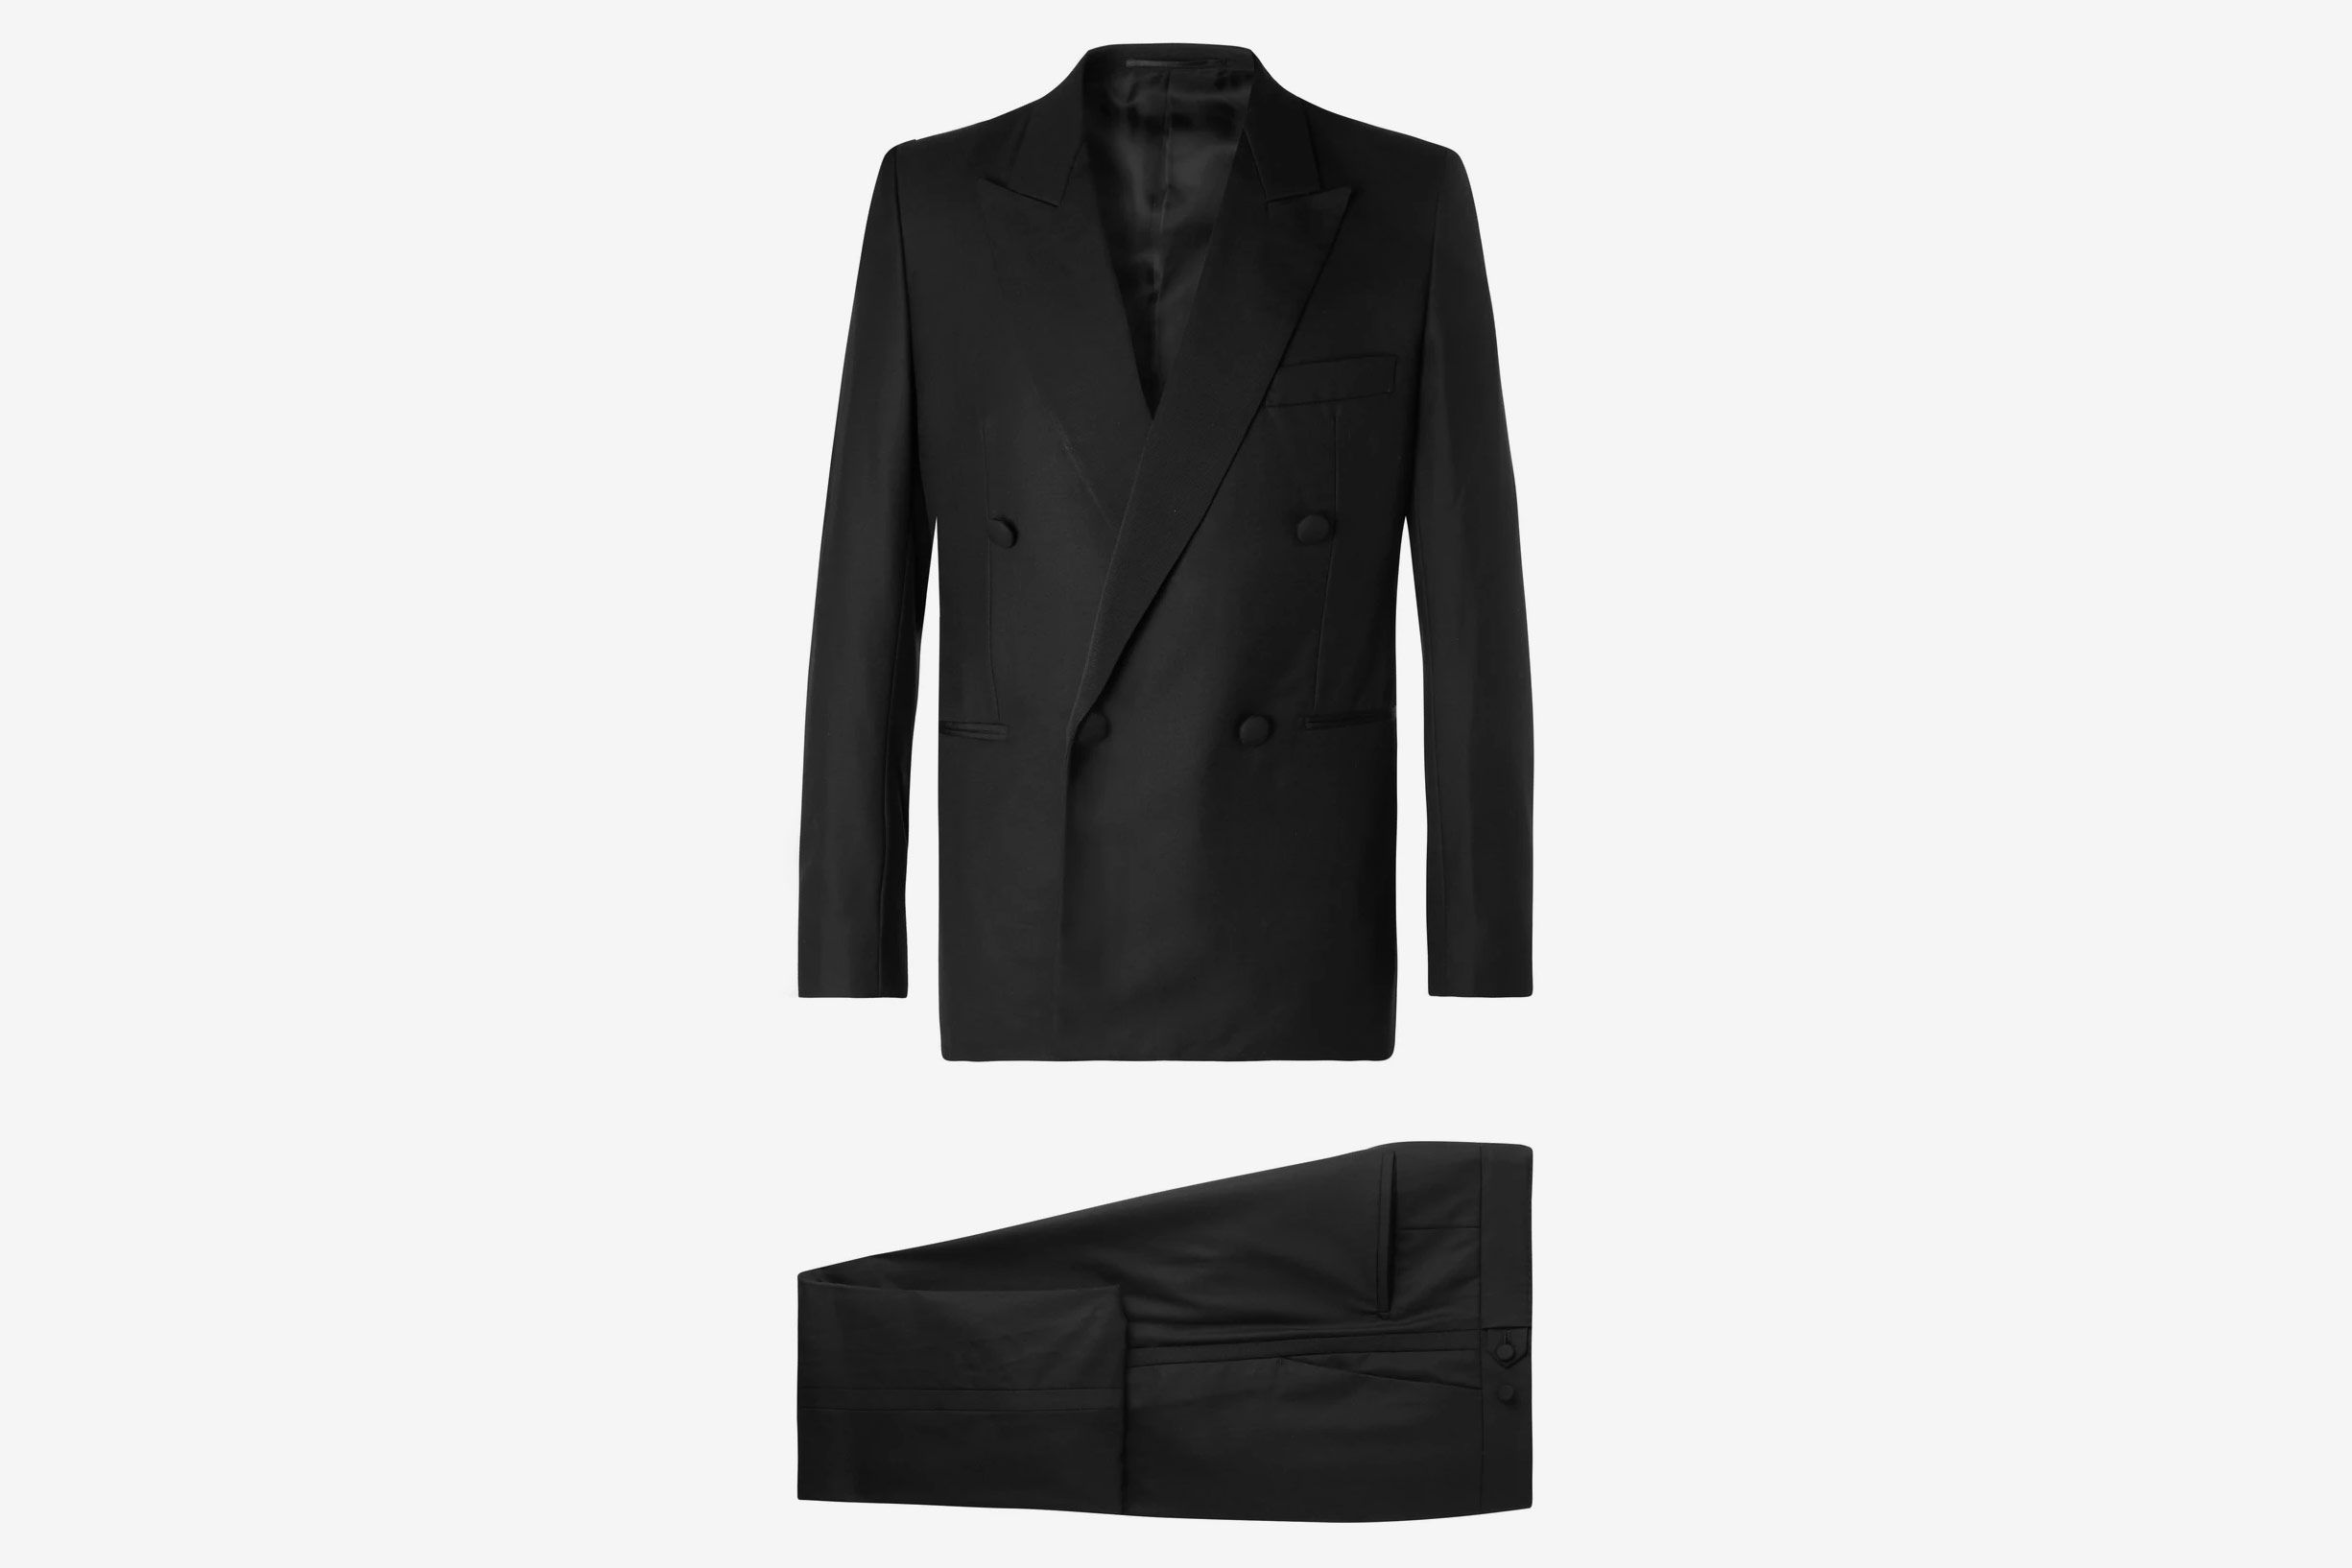 The Row Black Mark Slim-Fit Silk Grosgrain-Trimmed Escorial Wool Tuxedo